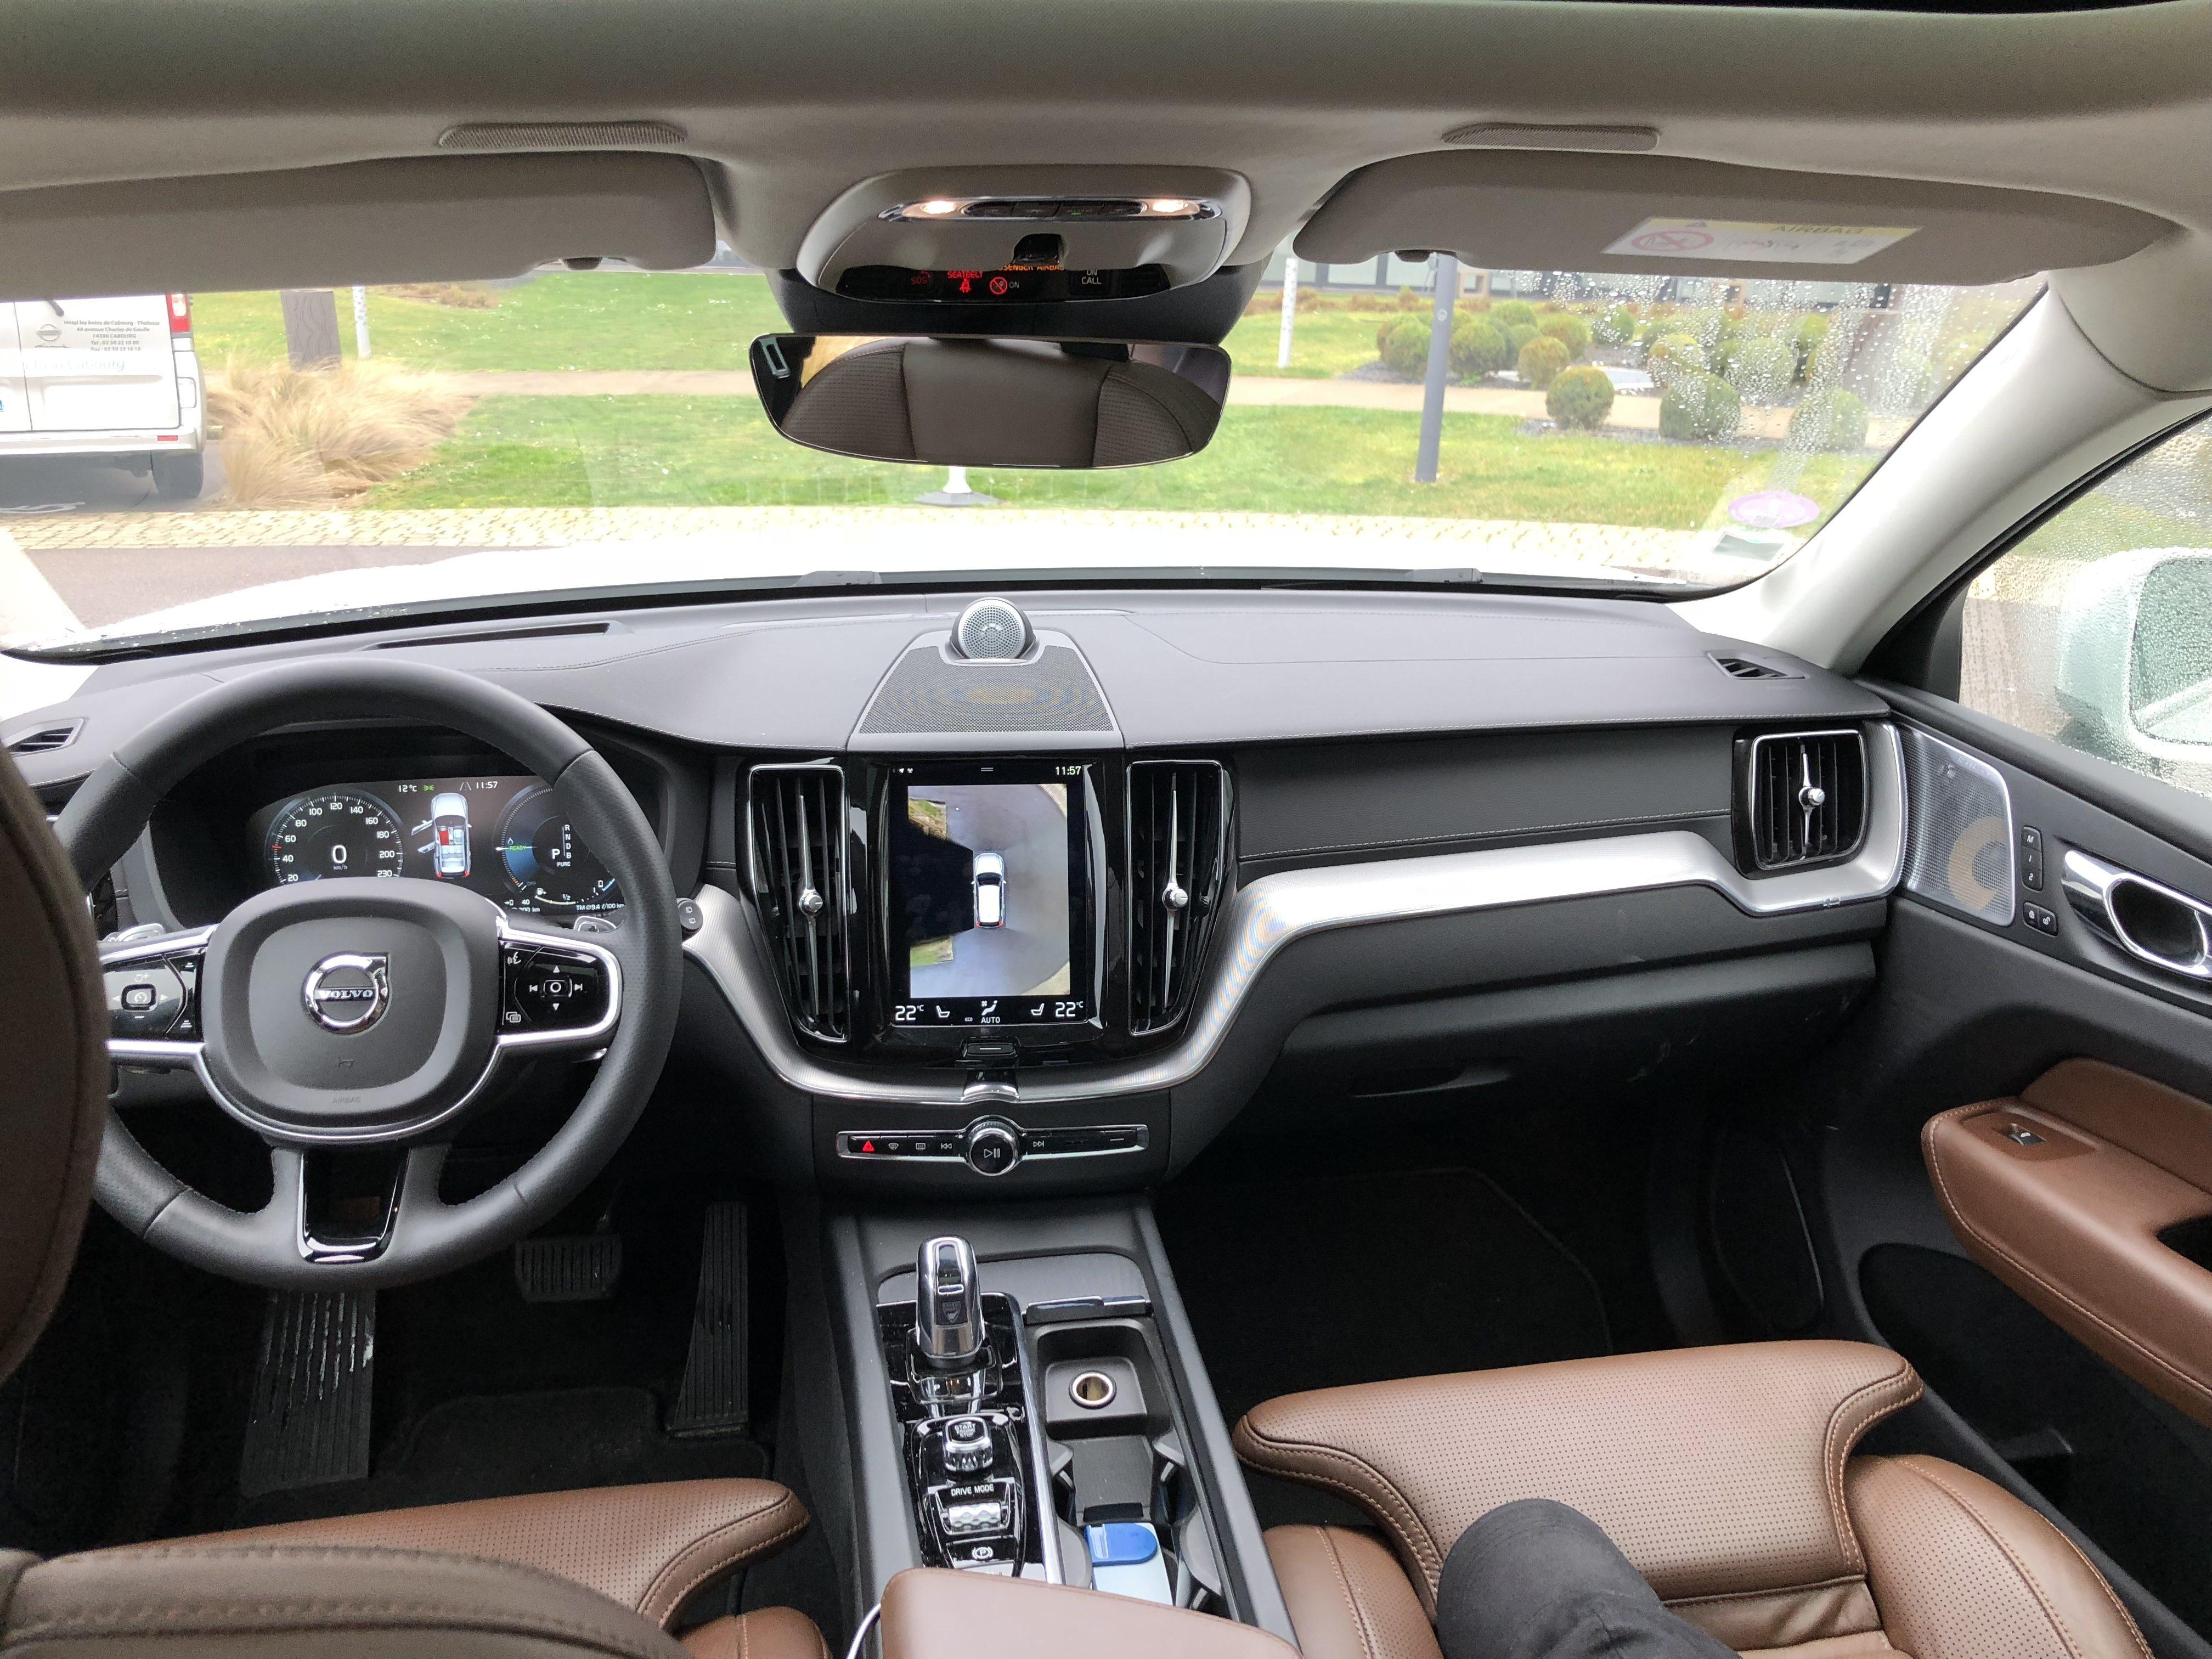 Essai Volvo Xc60 >> Volvo Xc60 T8 Le Compromis Ideal Essai Voiturelectrique Eu